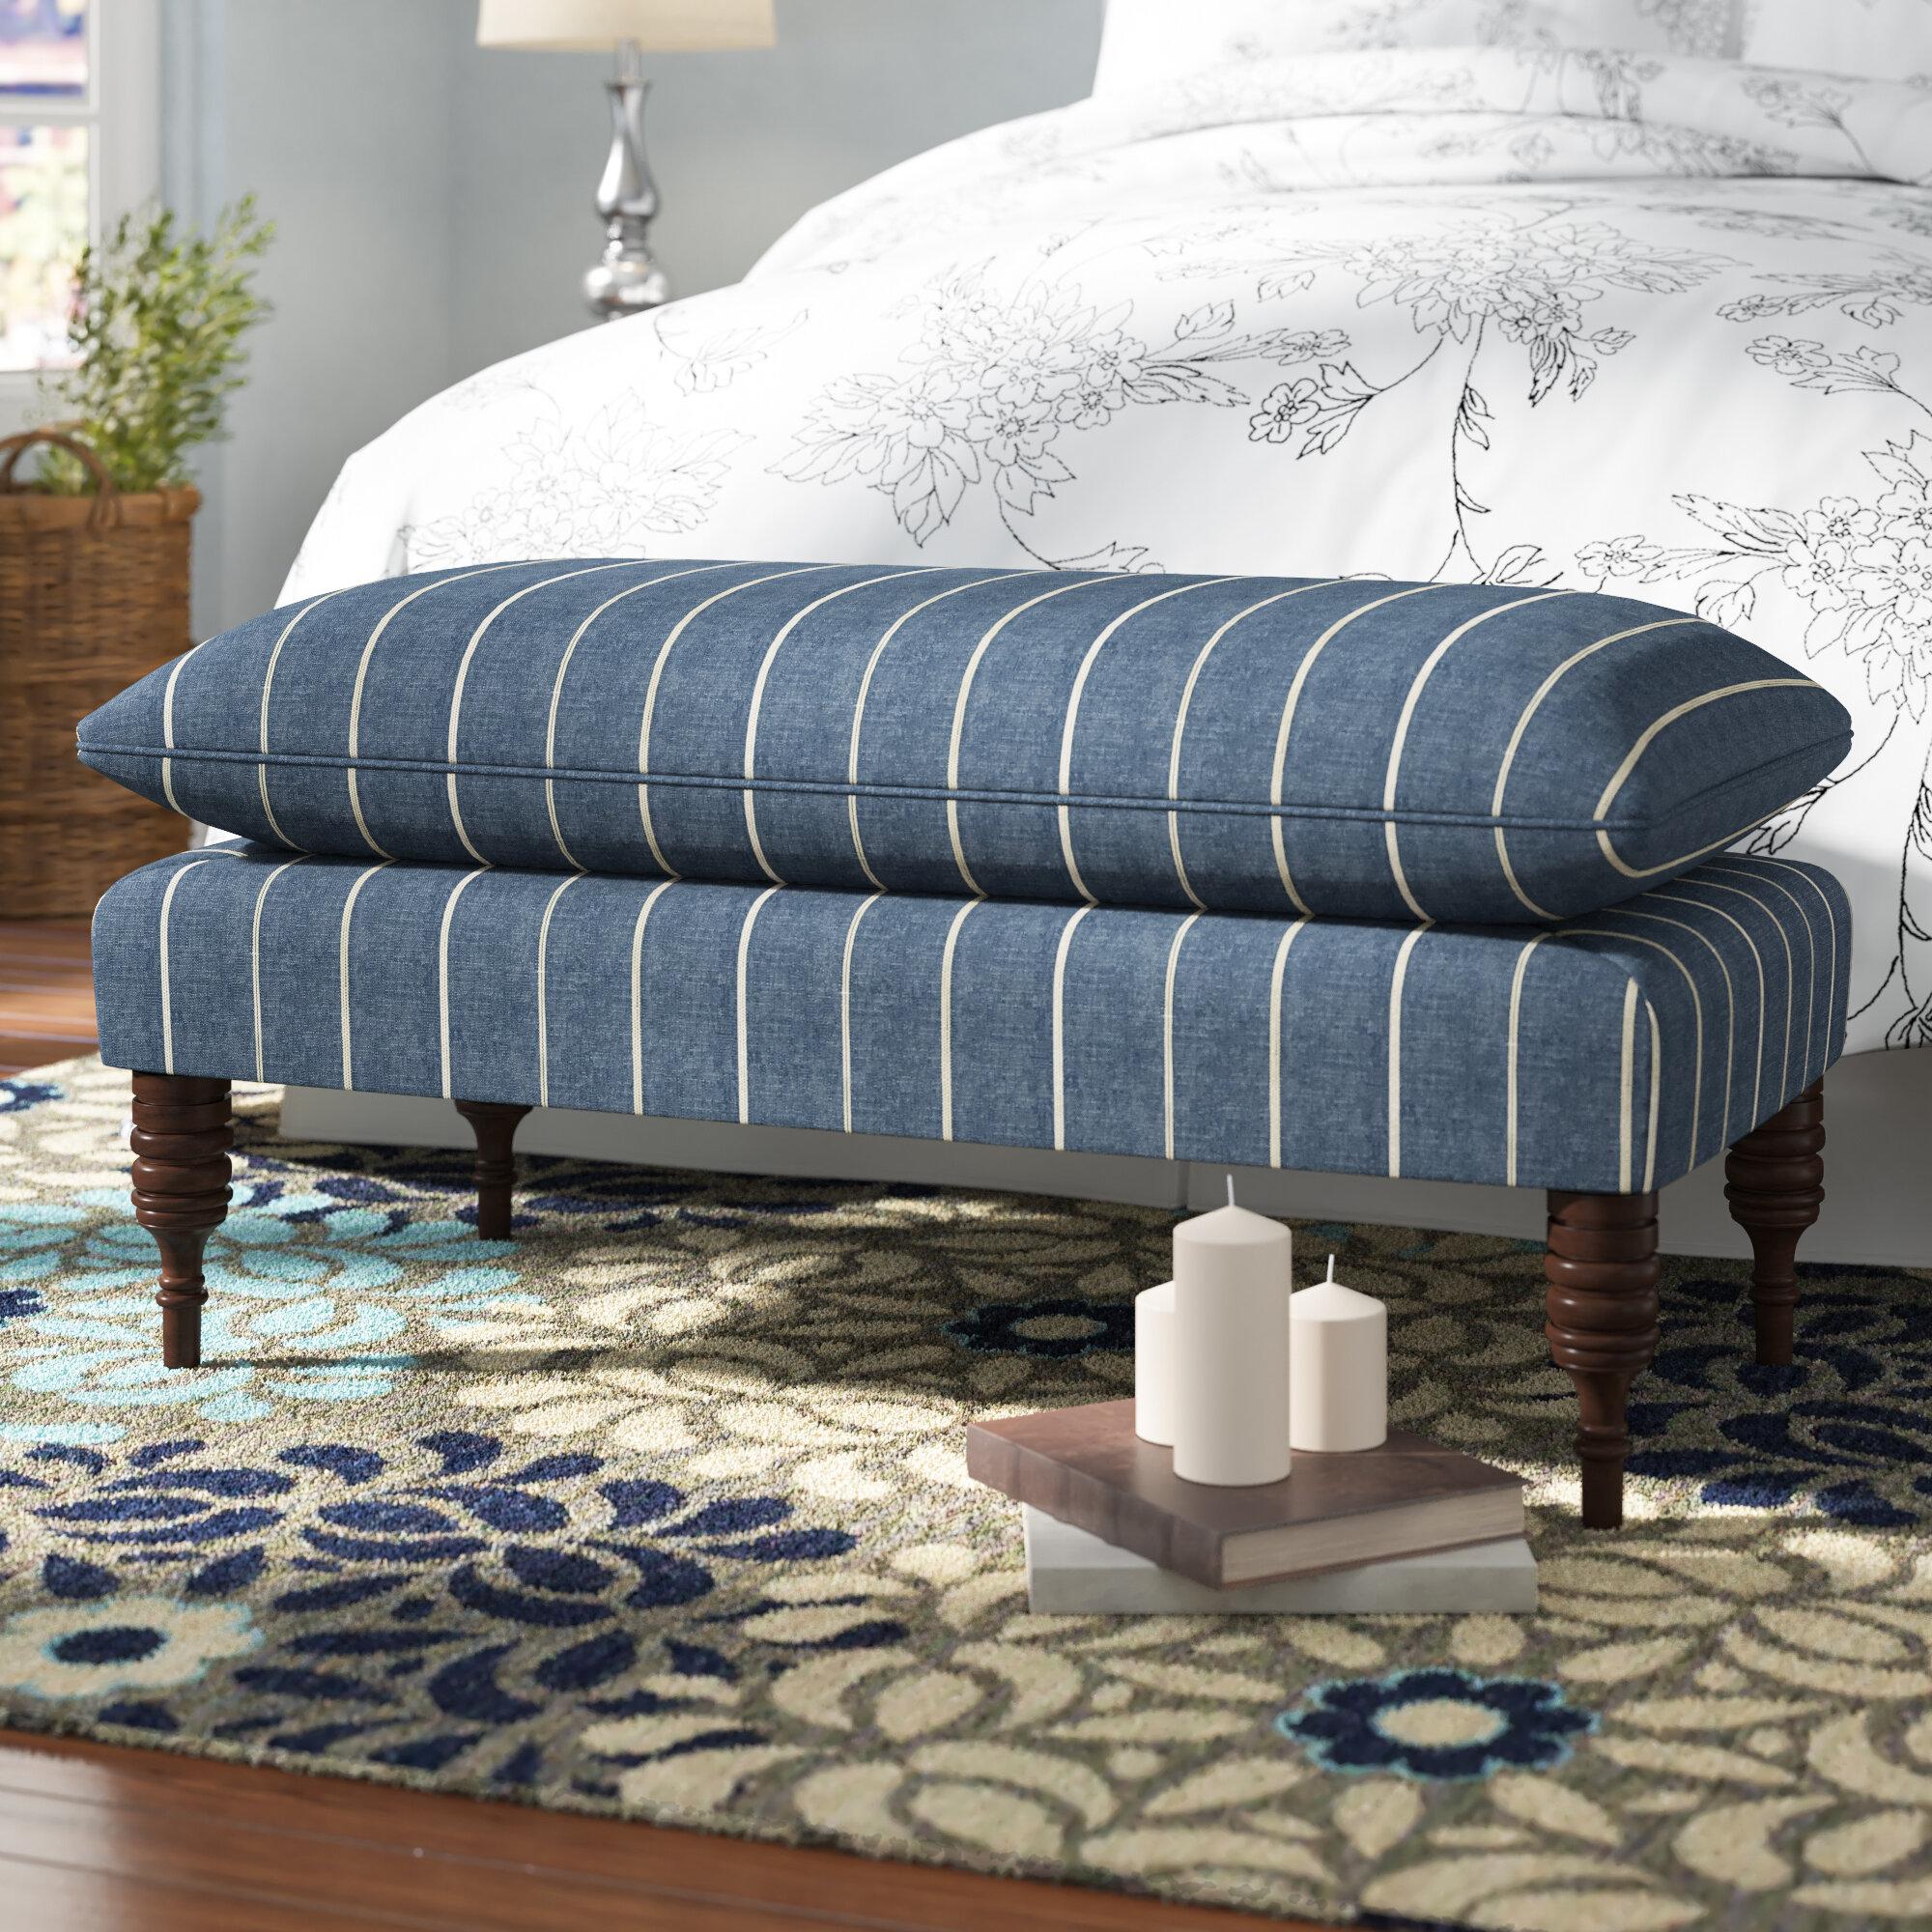 Astonishing Jordao Upholstered Wood Bench Evergreenethics Interior Chair Design Evergreenethicsorg